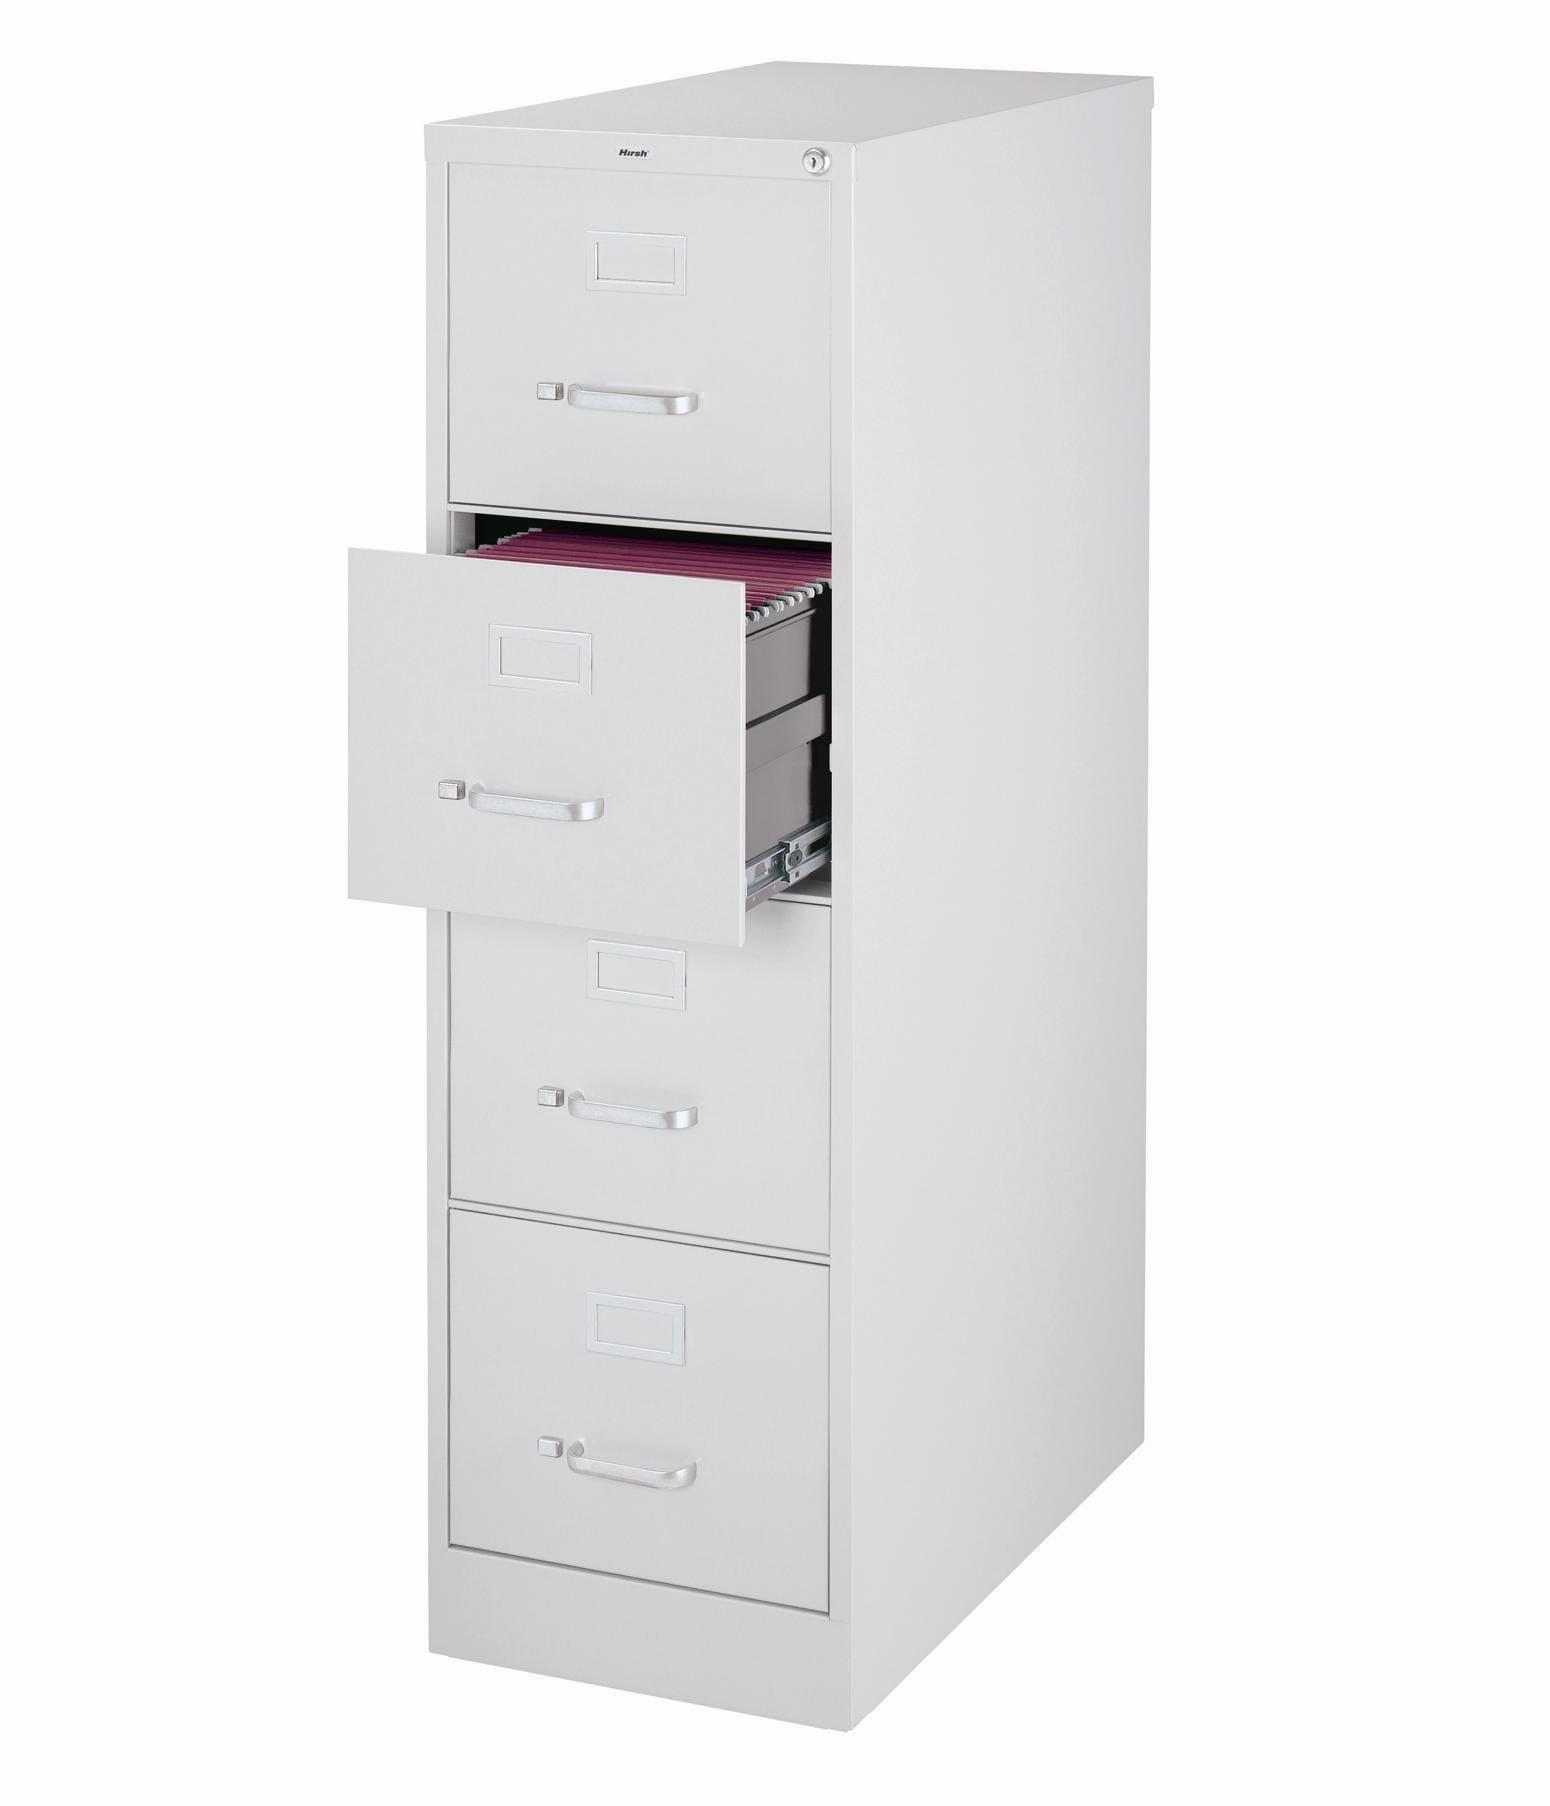 fresh at drawer decoration model cabinet file decor organization surprising lock hon attachment exterior